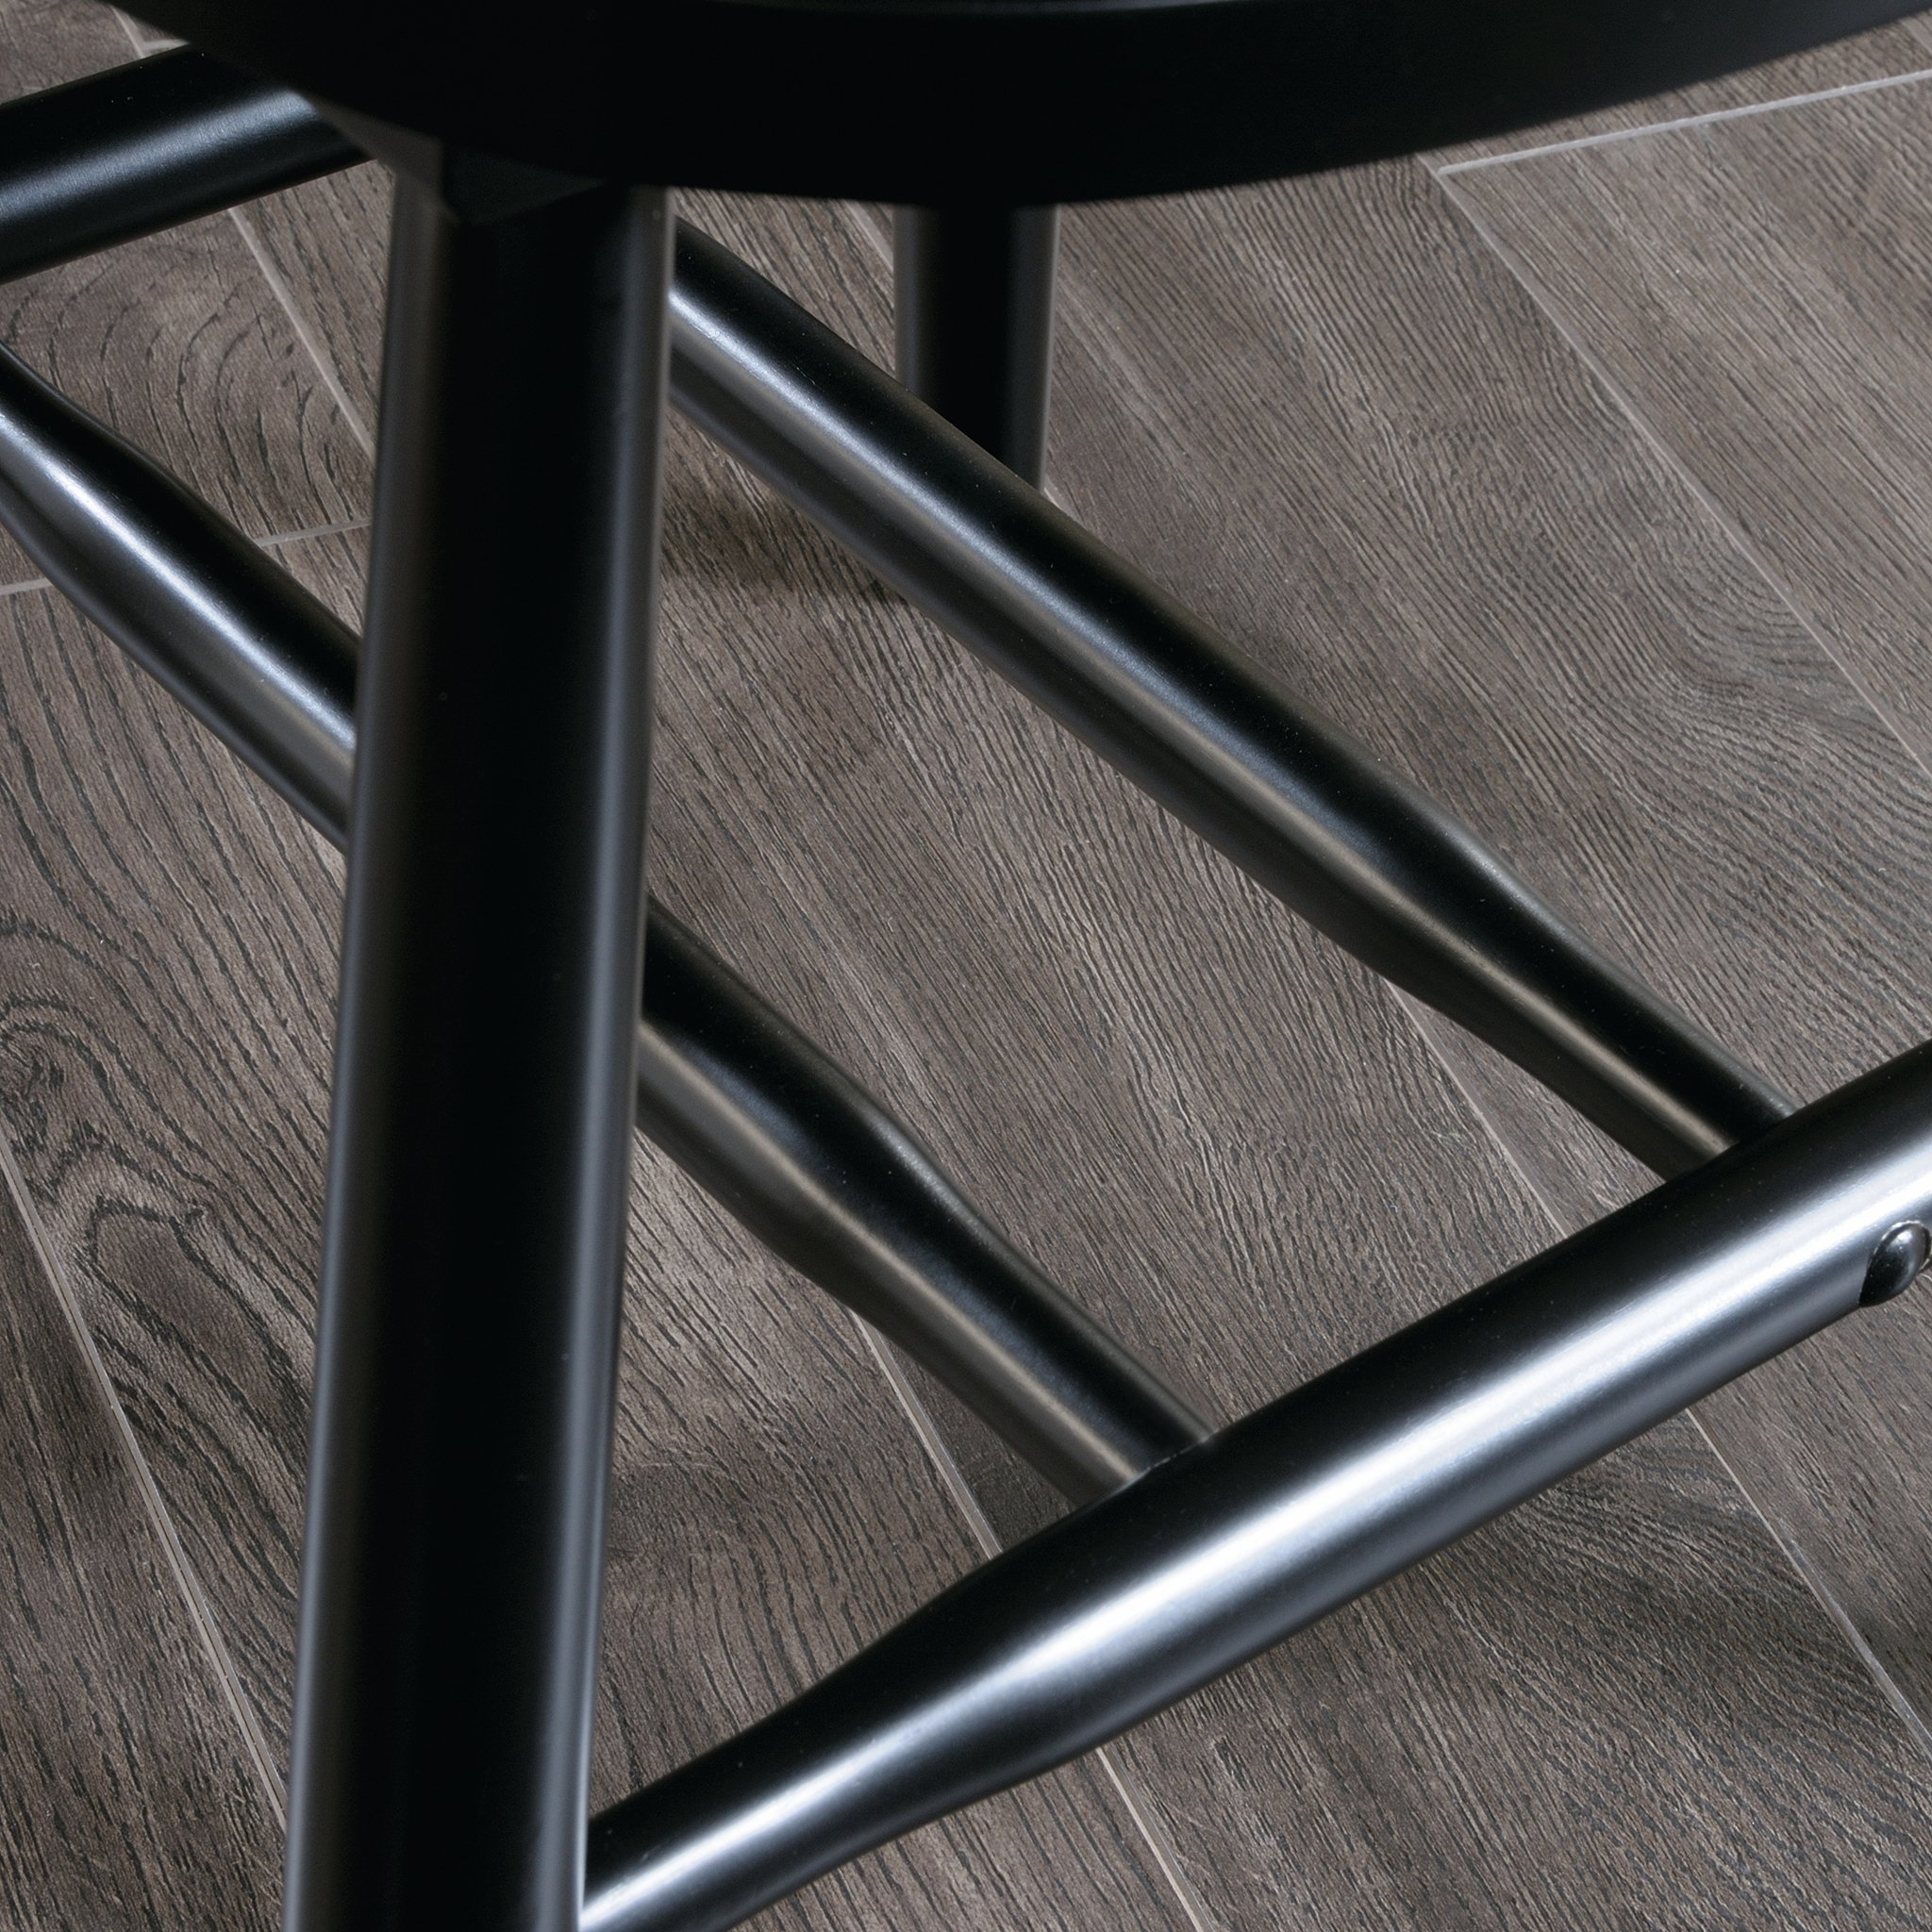 Sauder 418892 New Grange Spindle Back Chairs, L: 20.47'' x W: 21.26'' x H: 36.22'', Black finish by Sauder (Image #7)